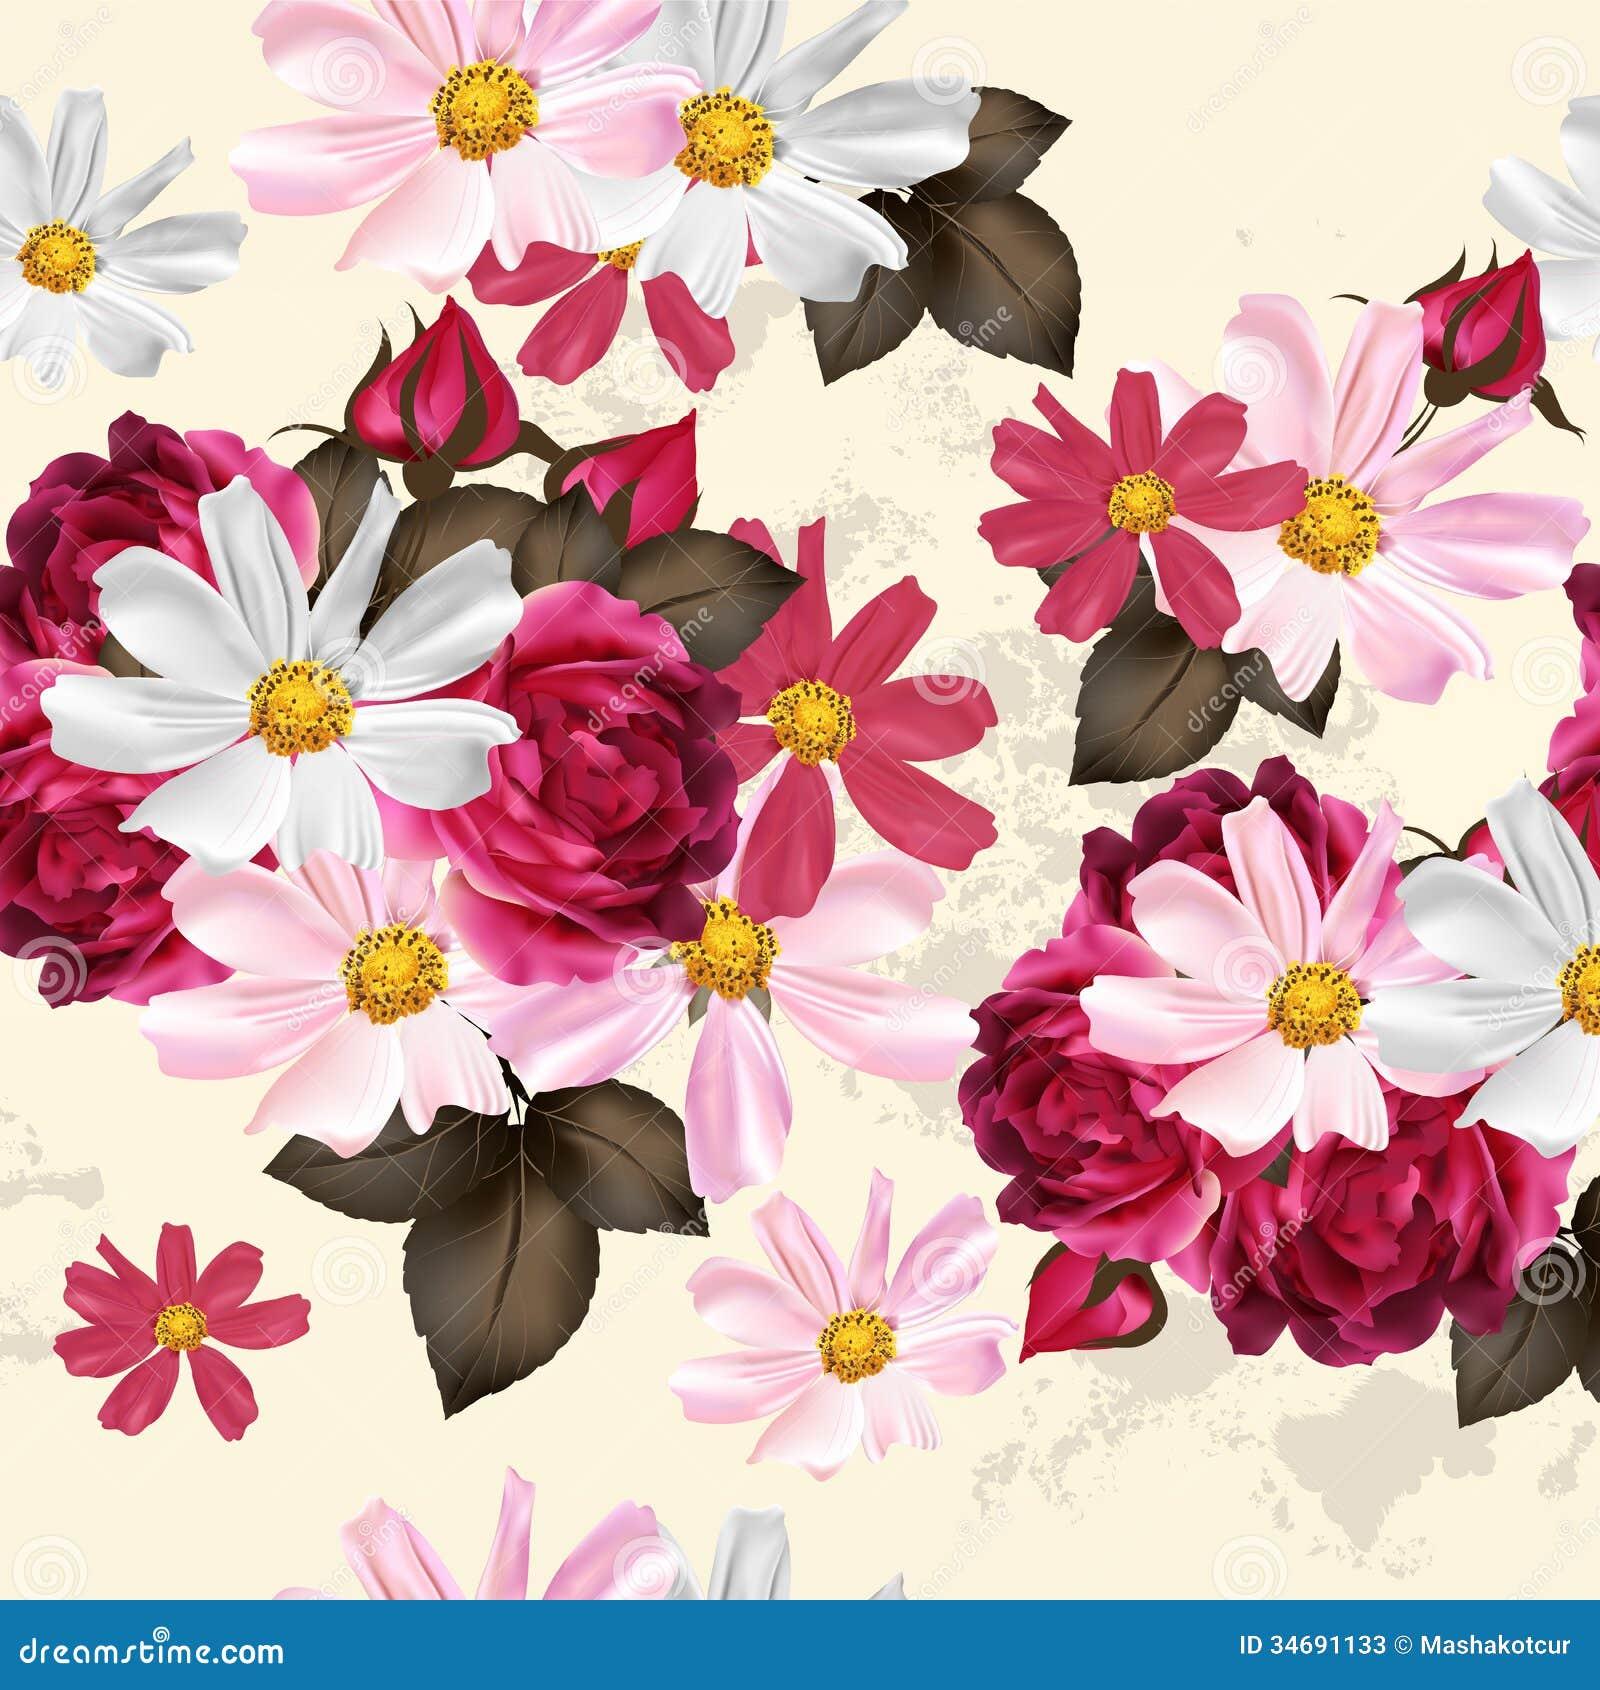 beautiful floral wallpaper designs - photo #37